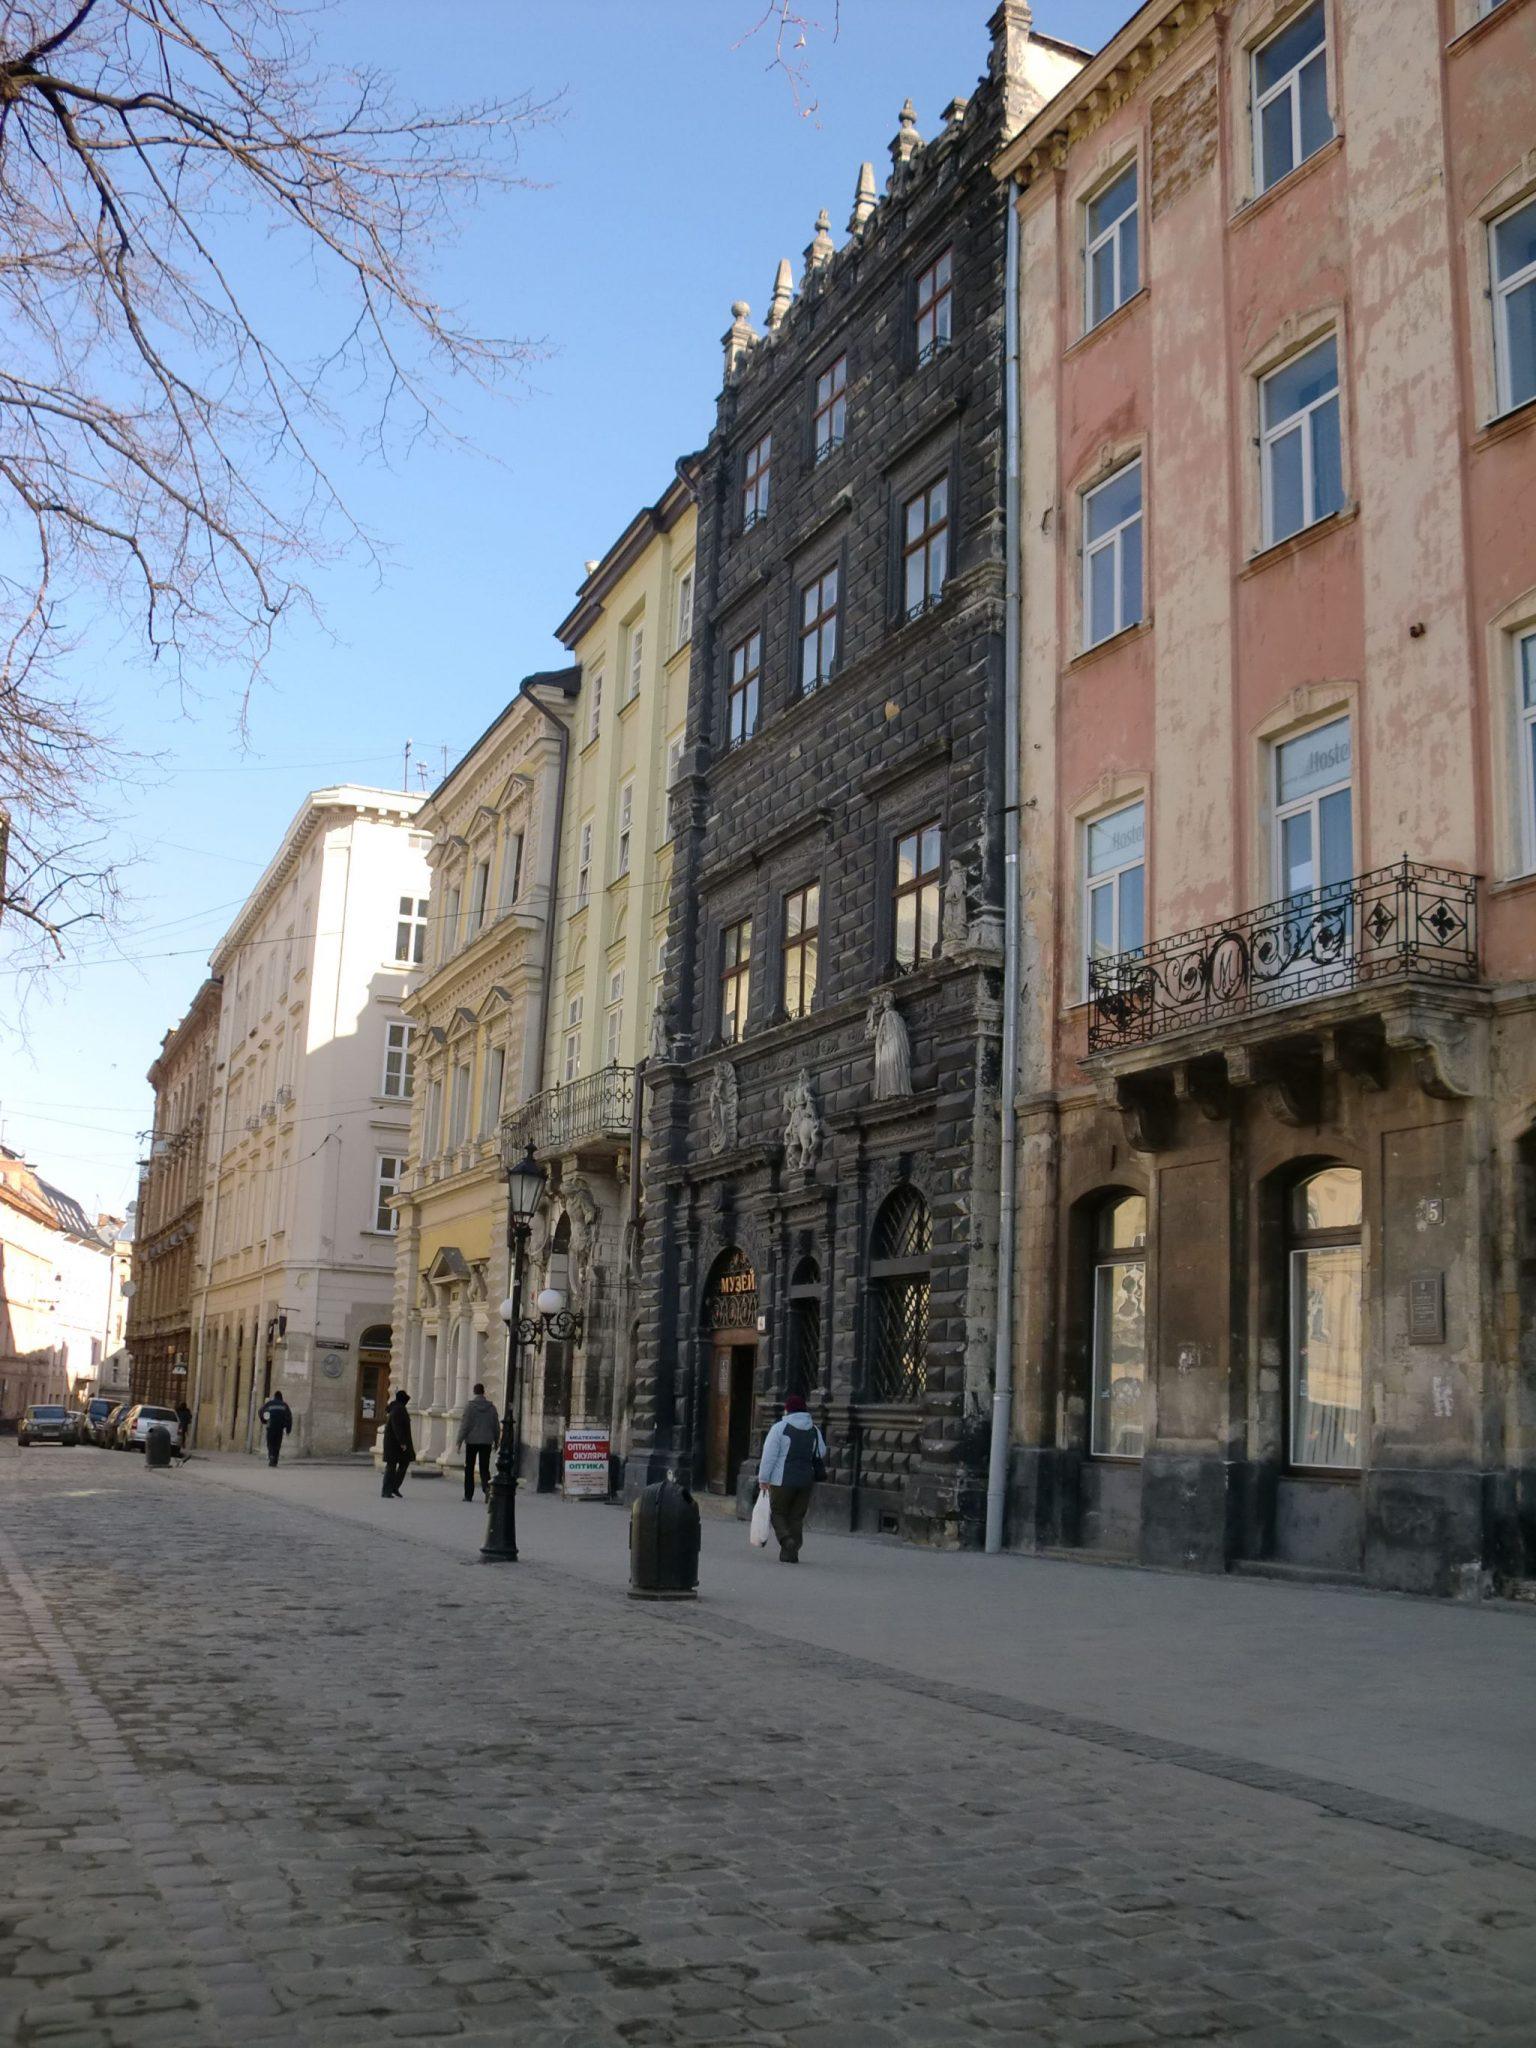 Lviv king palace - Lviv, the Ukrainian pearl